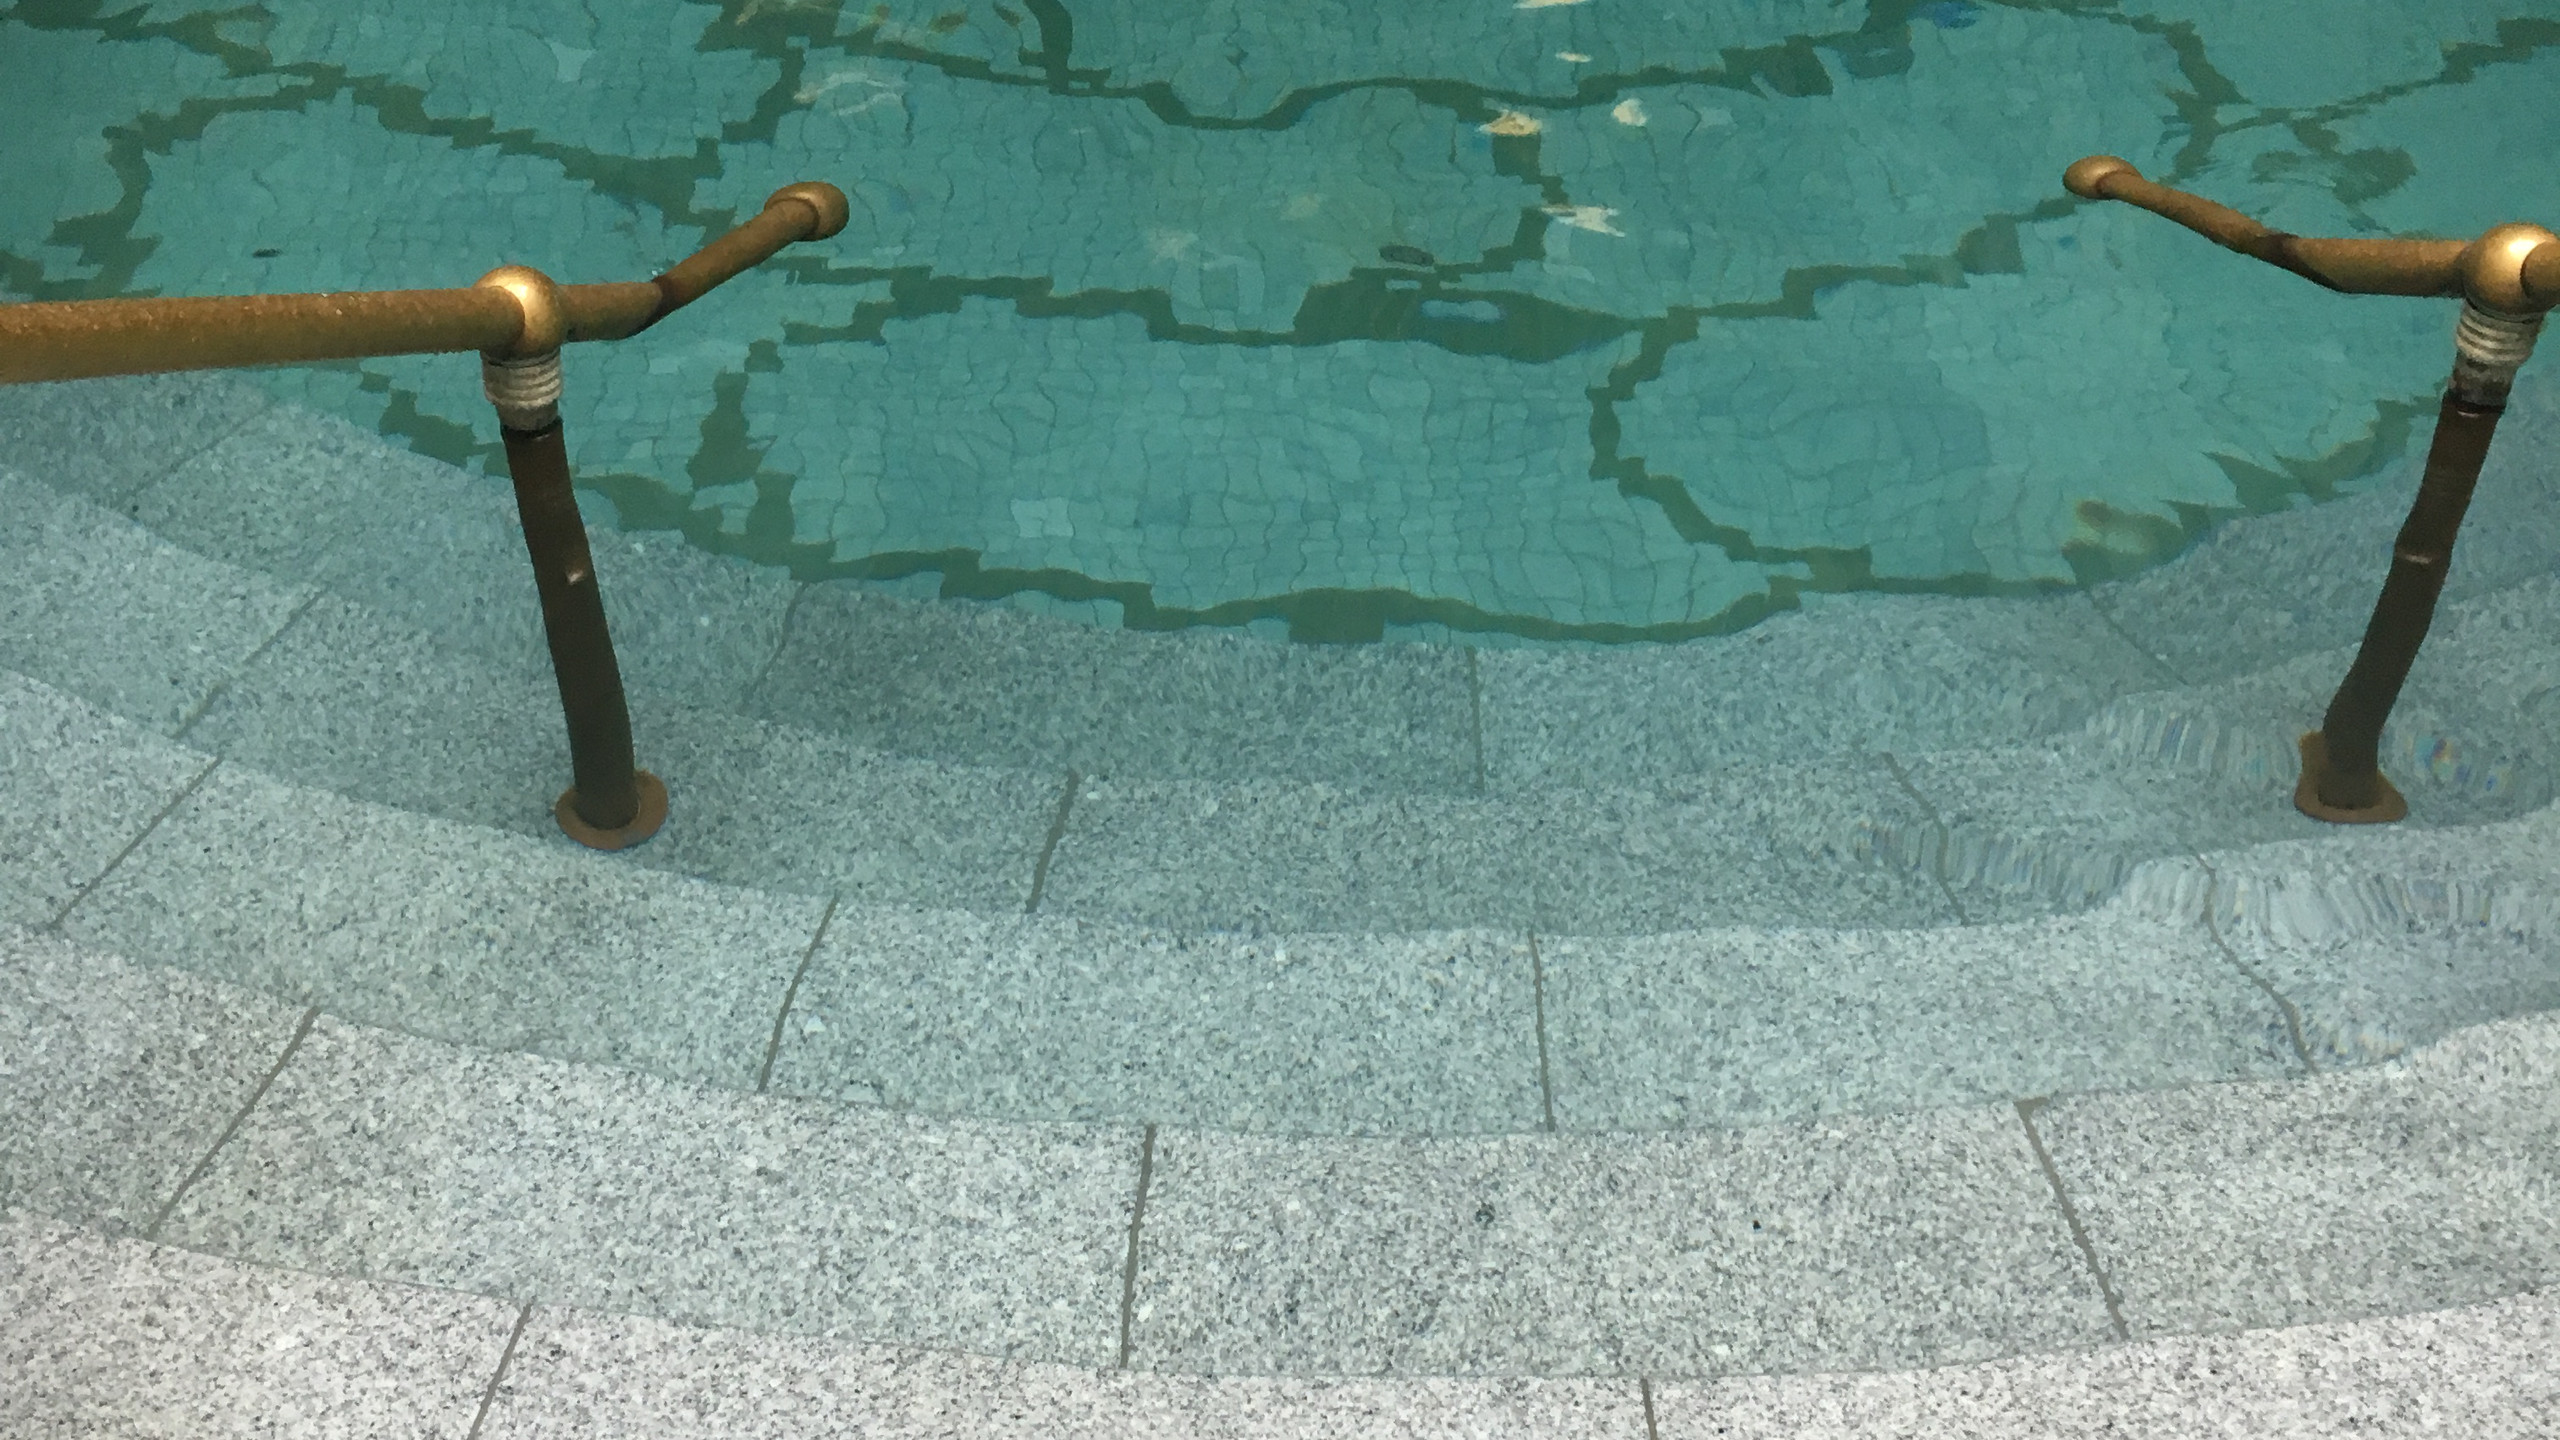 The pool I entered.